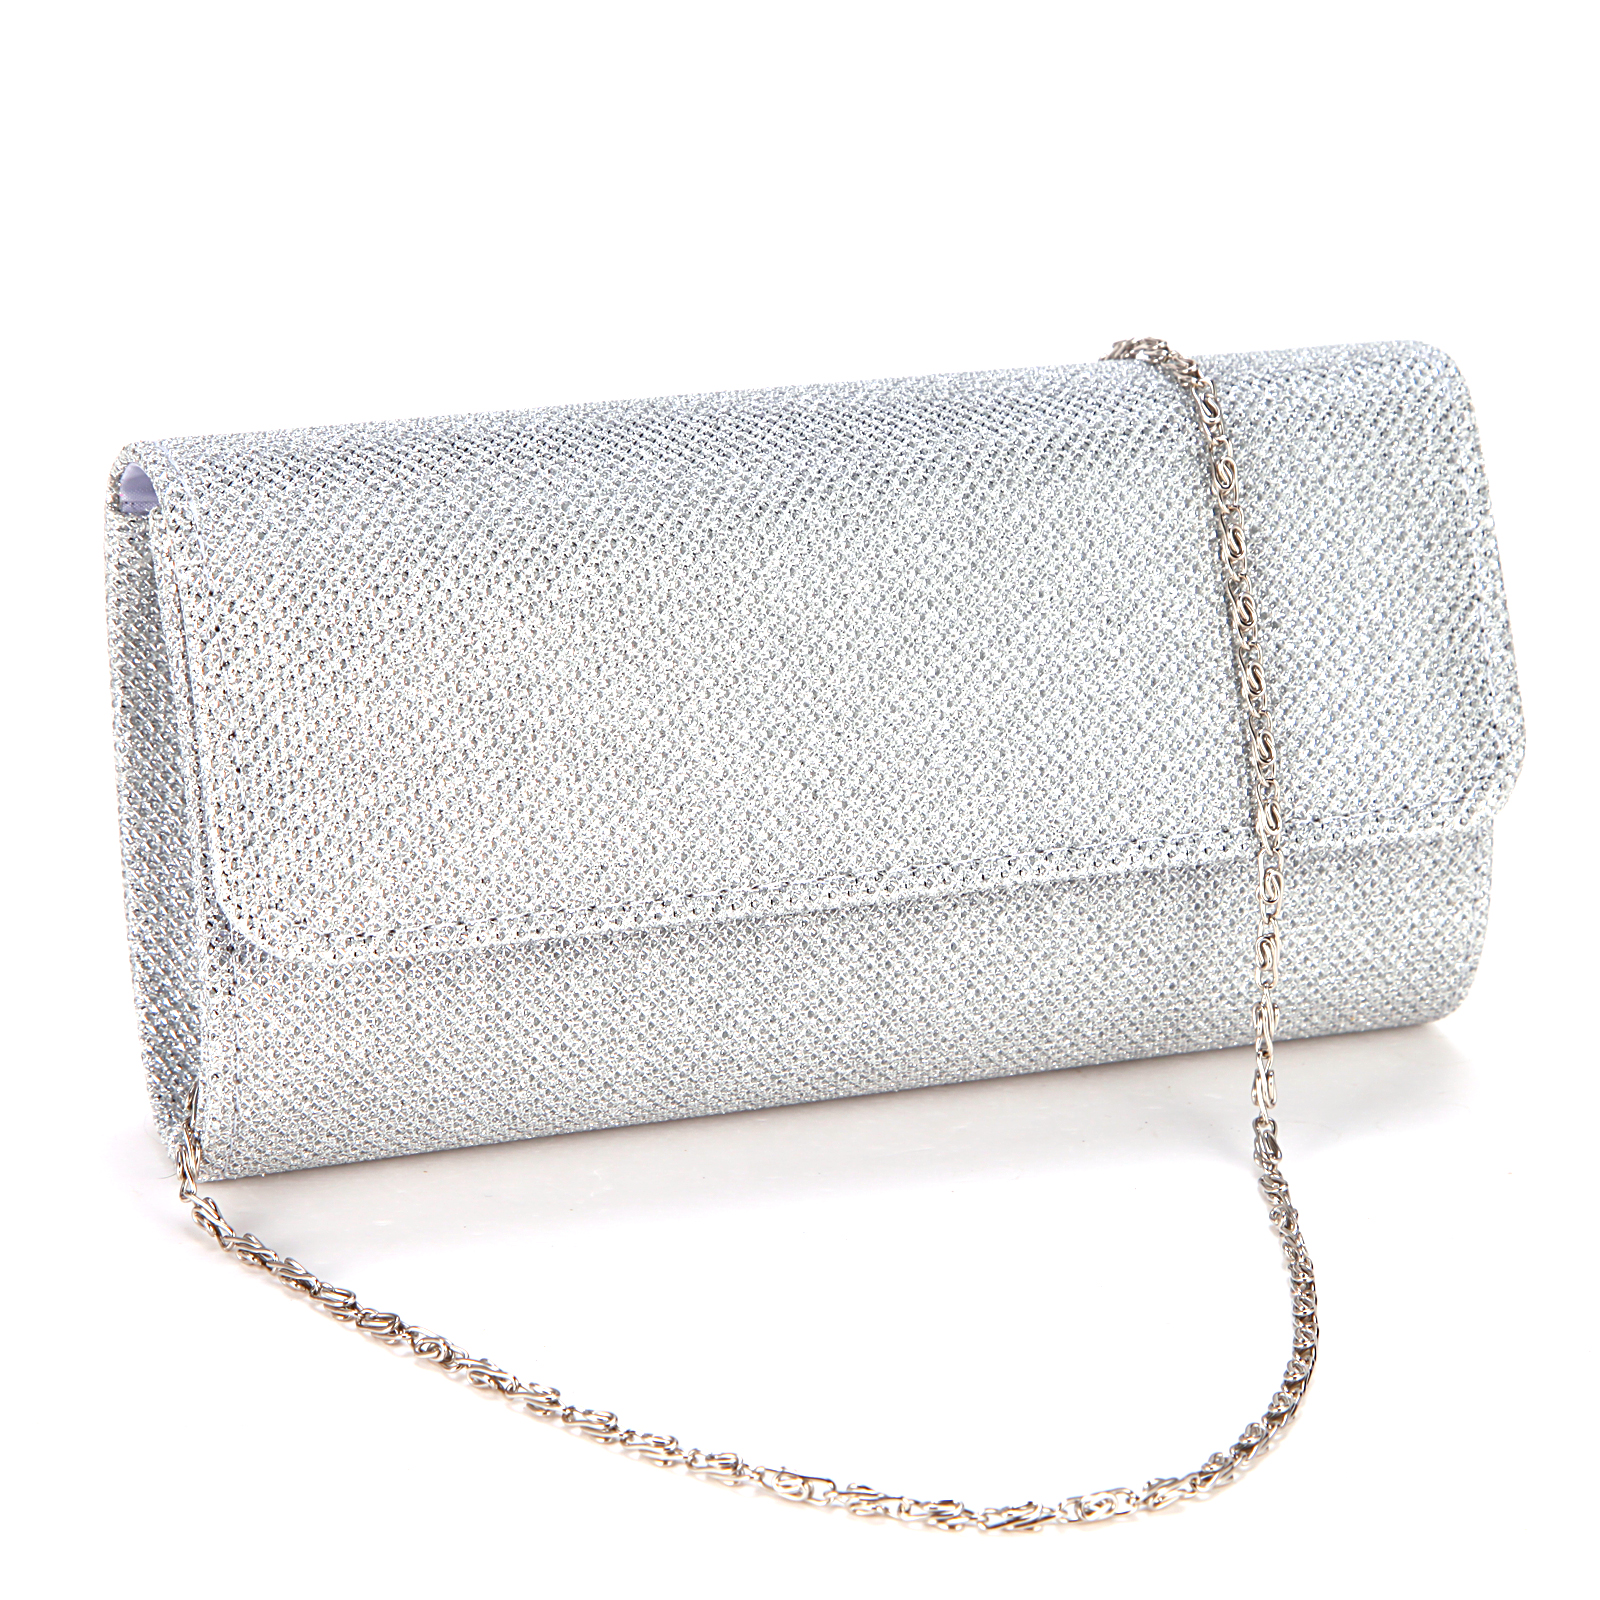 Details about Ladies Evening Clutch Bag Bridal Bridesmaid Handbag Purse Crossbody Shoulder Bag